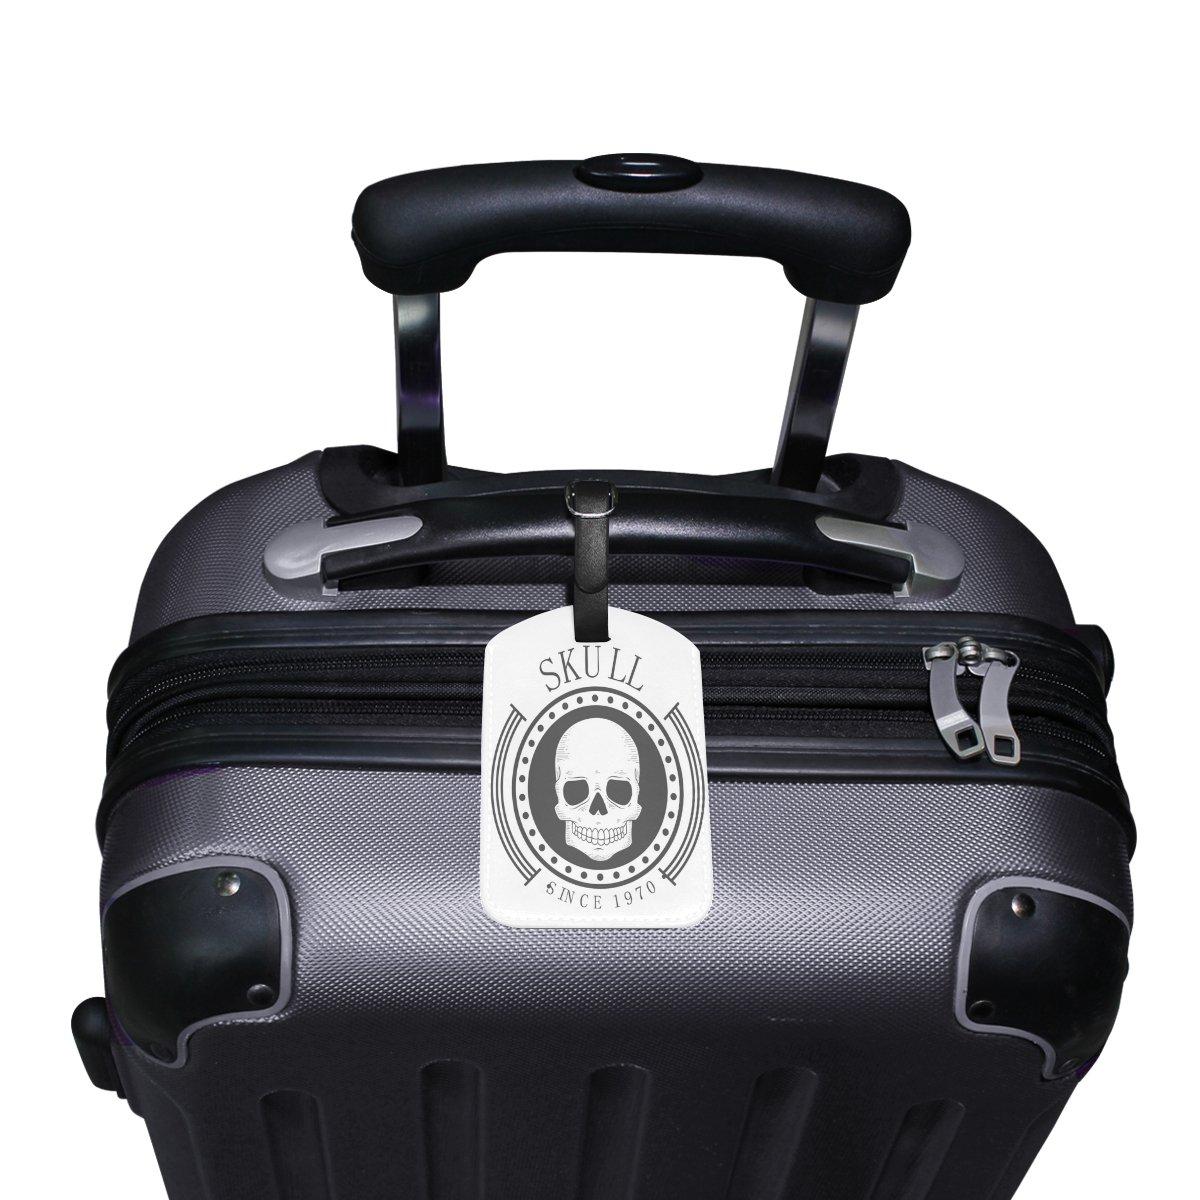 Saobao Travel Luggage Tag Skull PU Leather Baggage Suitcase Travel ID Bag Tag 1Pcs